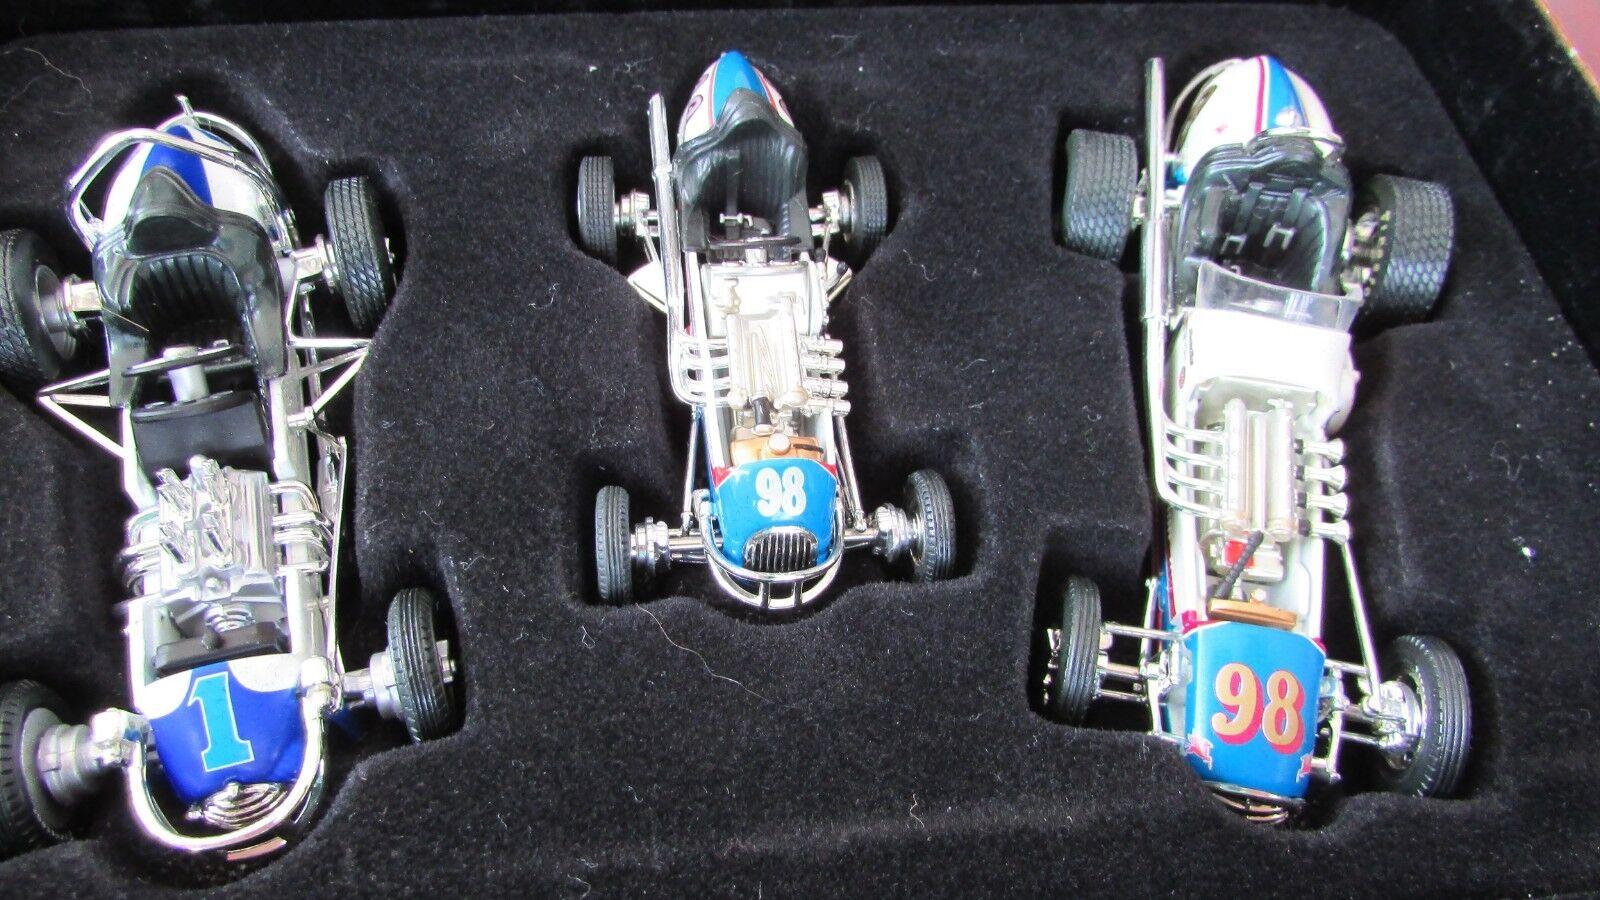 1 43 GMP Parnelli Jones 3 dirt race car set Agajanian owned midget sprint Champ